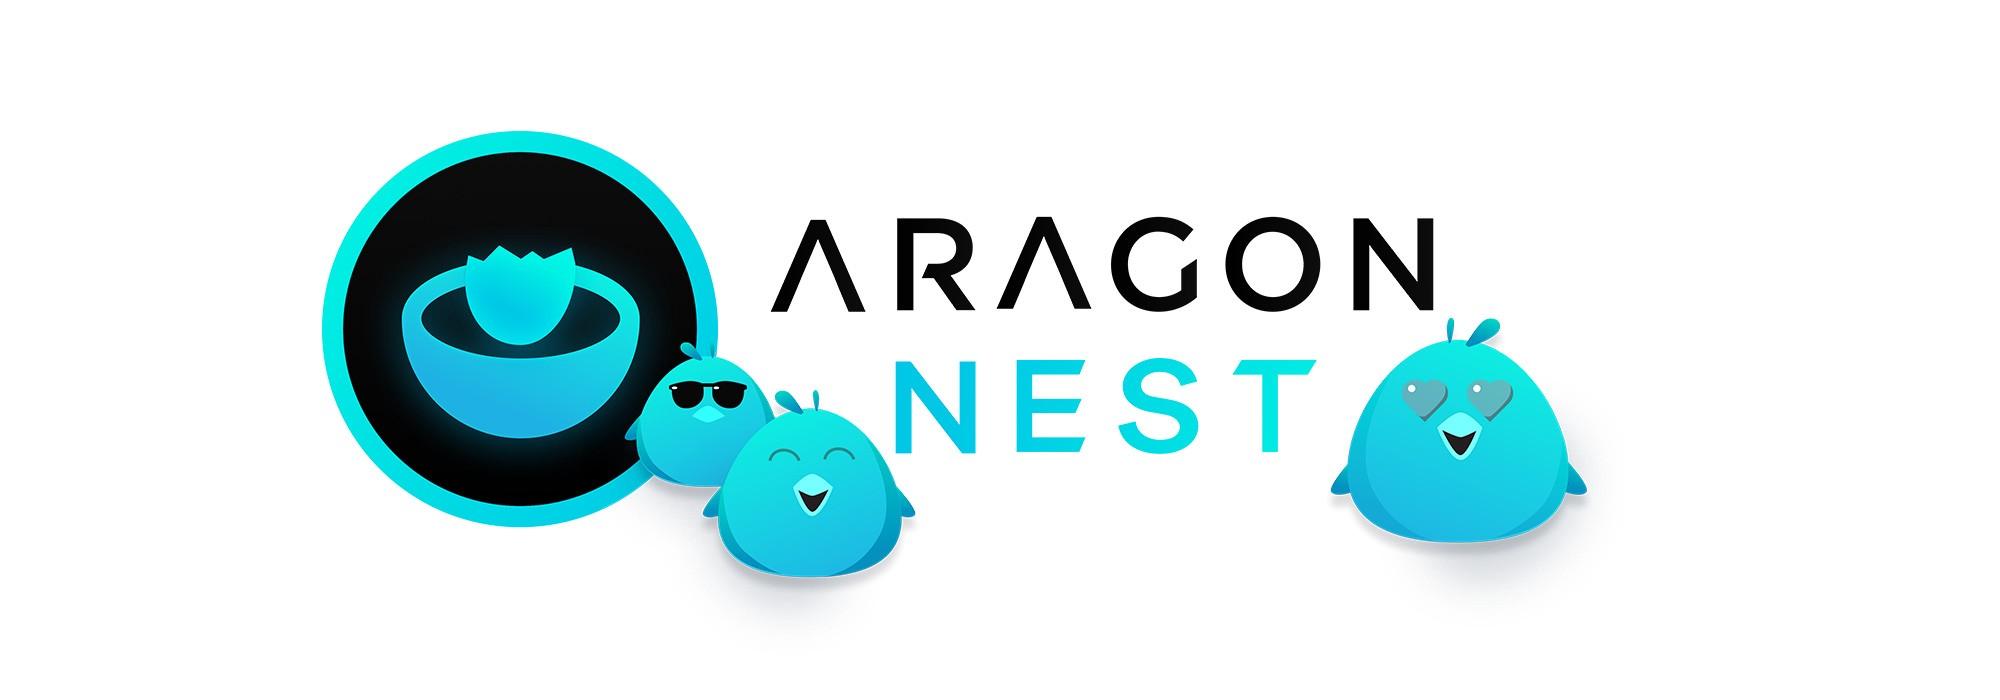 Aragon Nest: First awarded grants